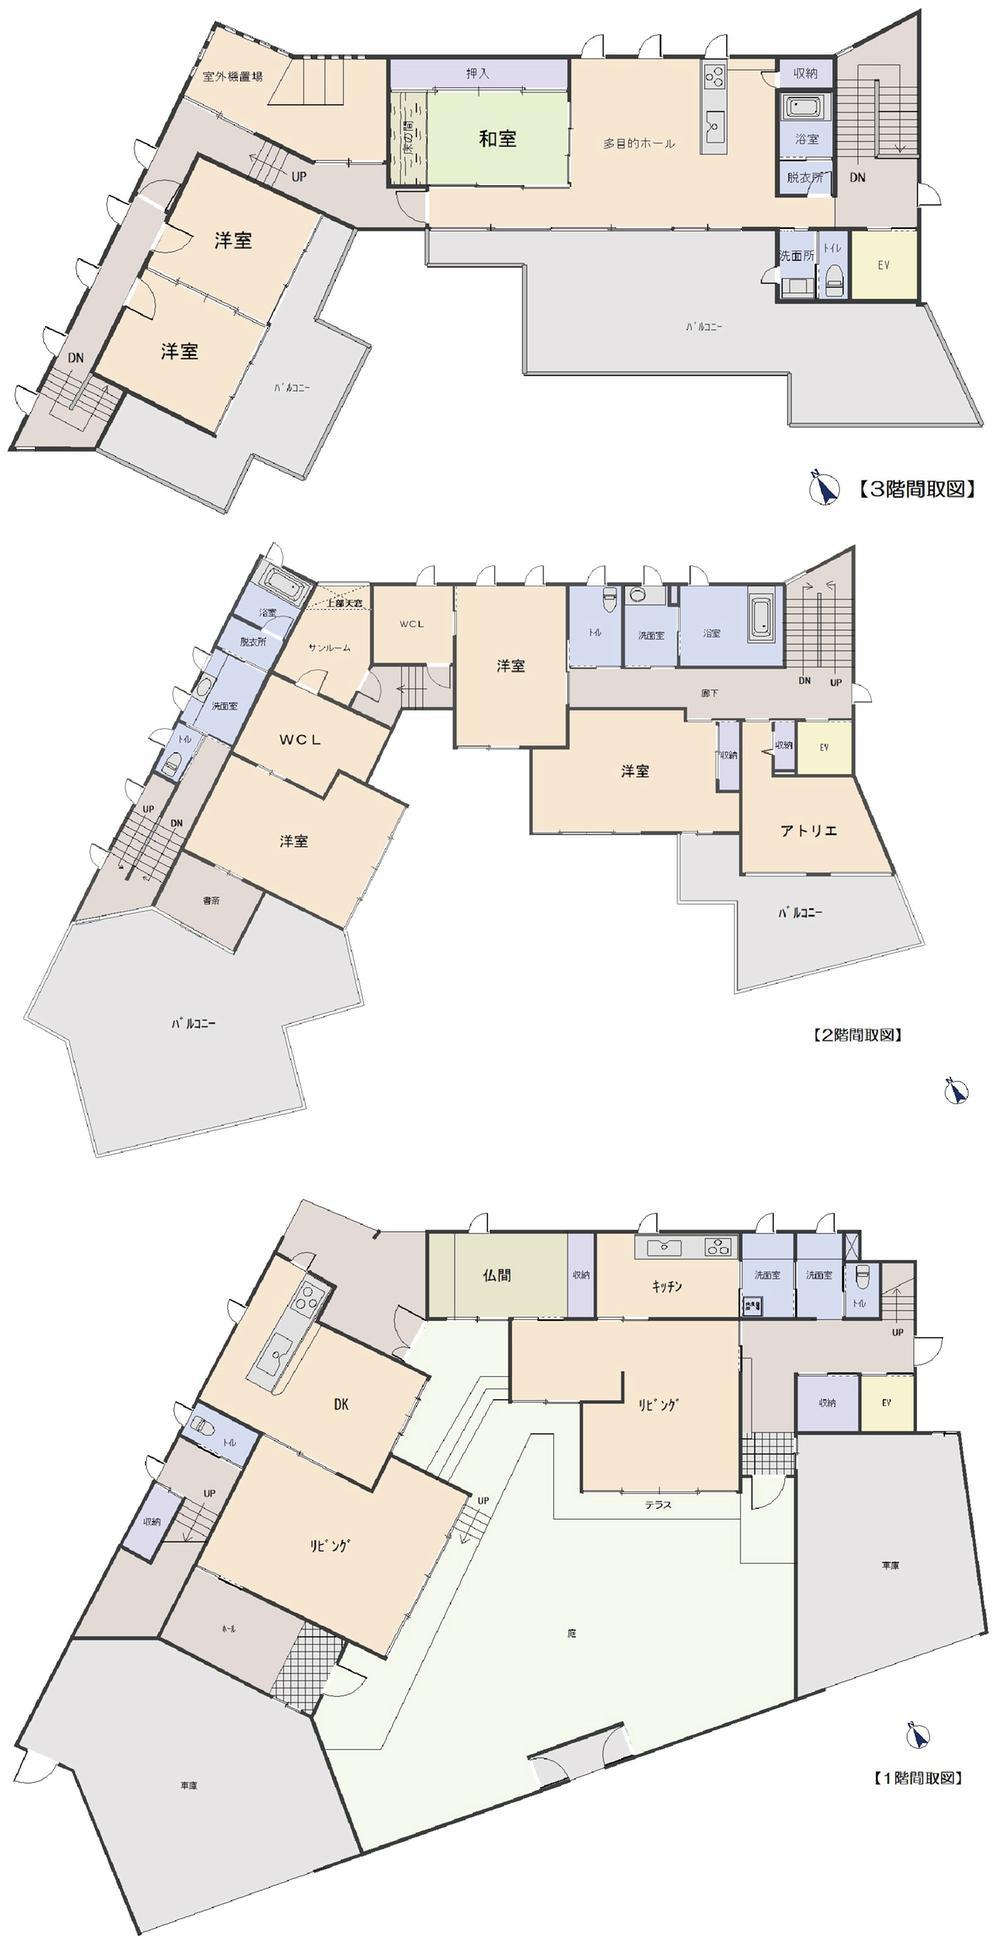 8650万円、9LDK、土地面積560.66m<sup>2</sup>、建物面積562.88m<sup>2</sup>